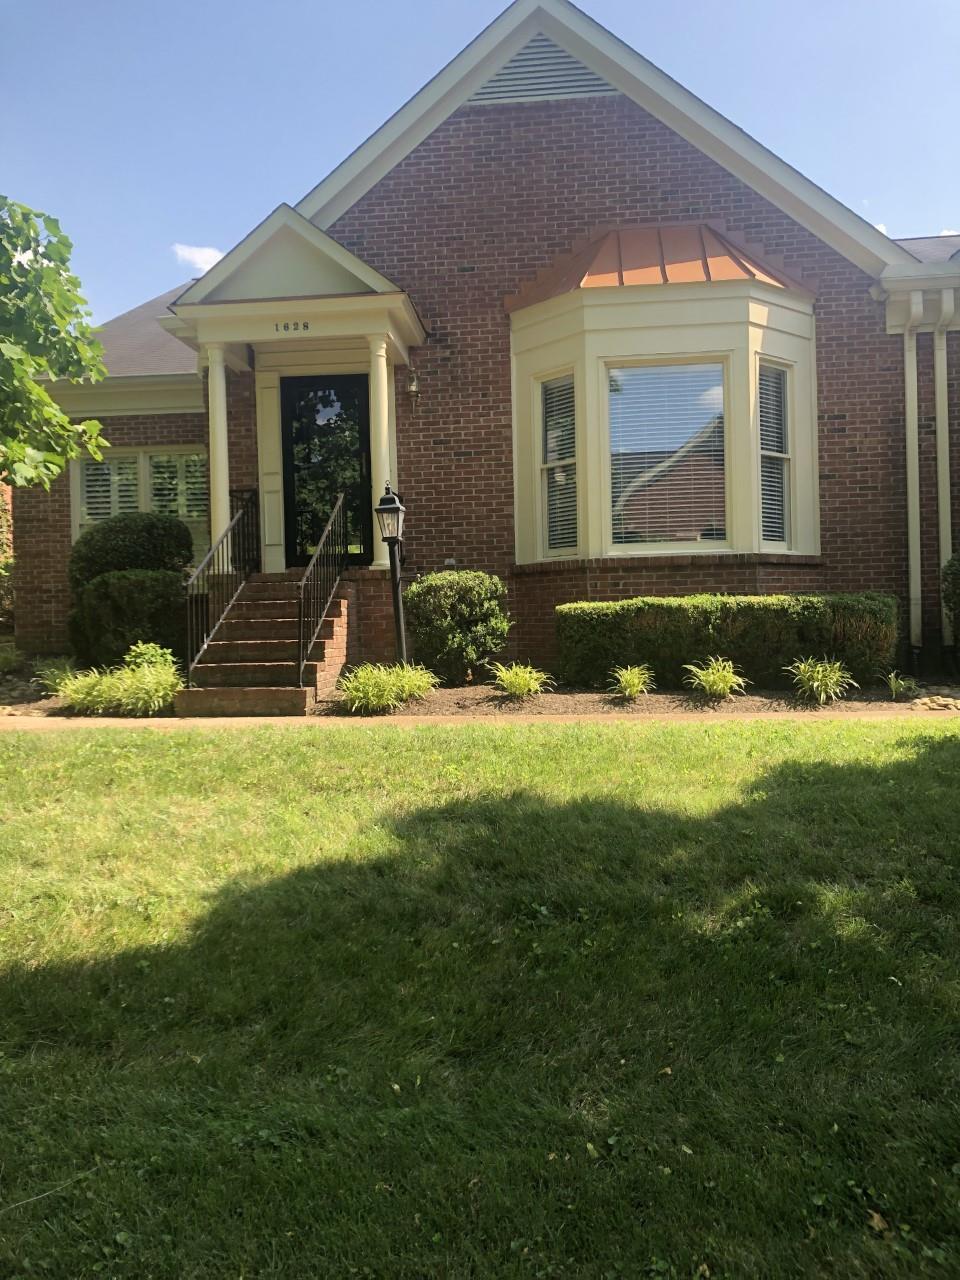 1628 Belmont Ct, Murfreesboro, TN 37129 - Murfreesboro, TN real estate listing